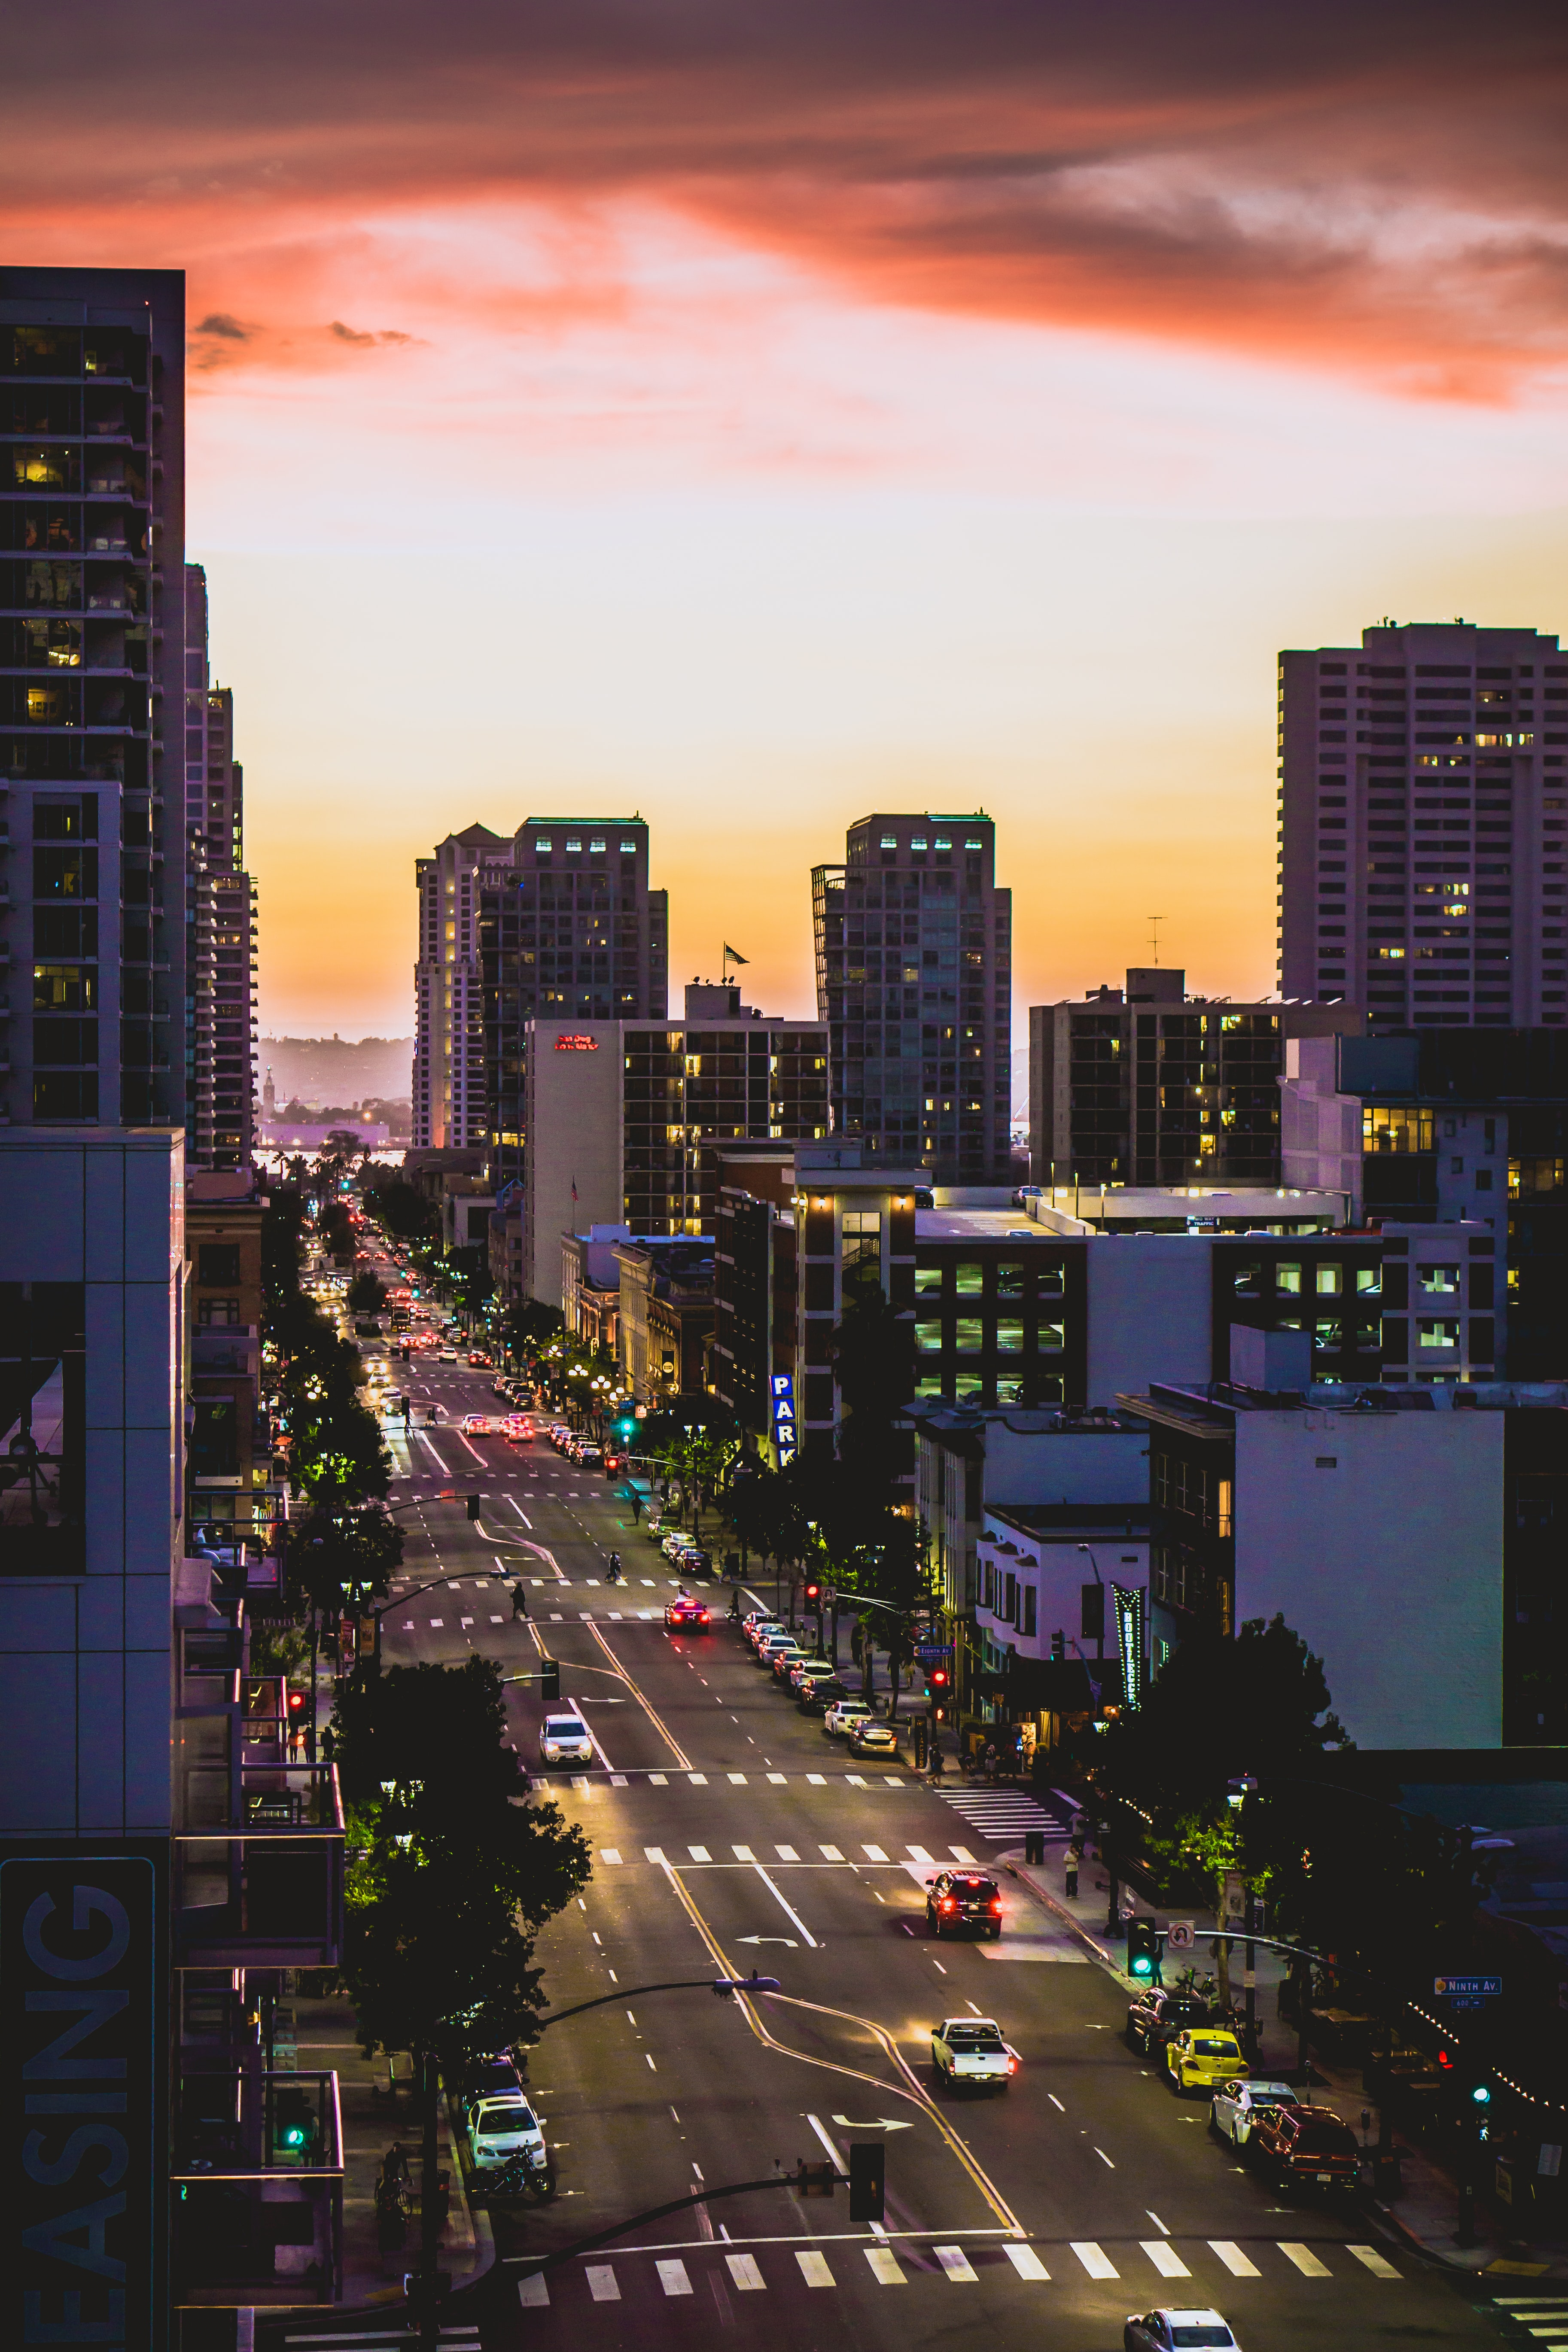 East Village in San Diego